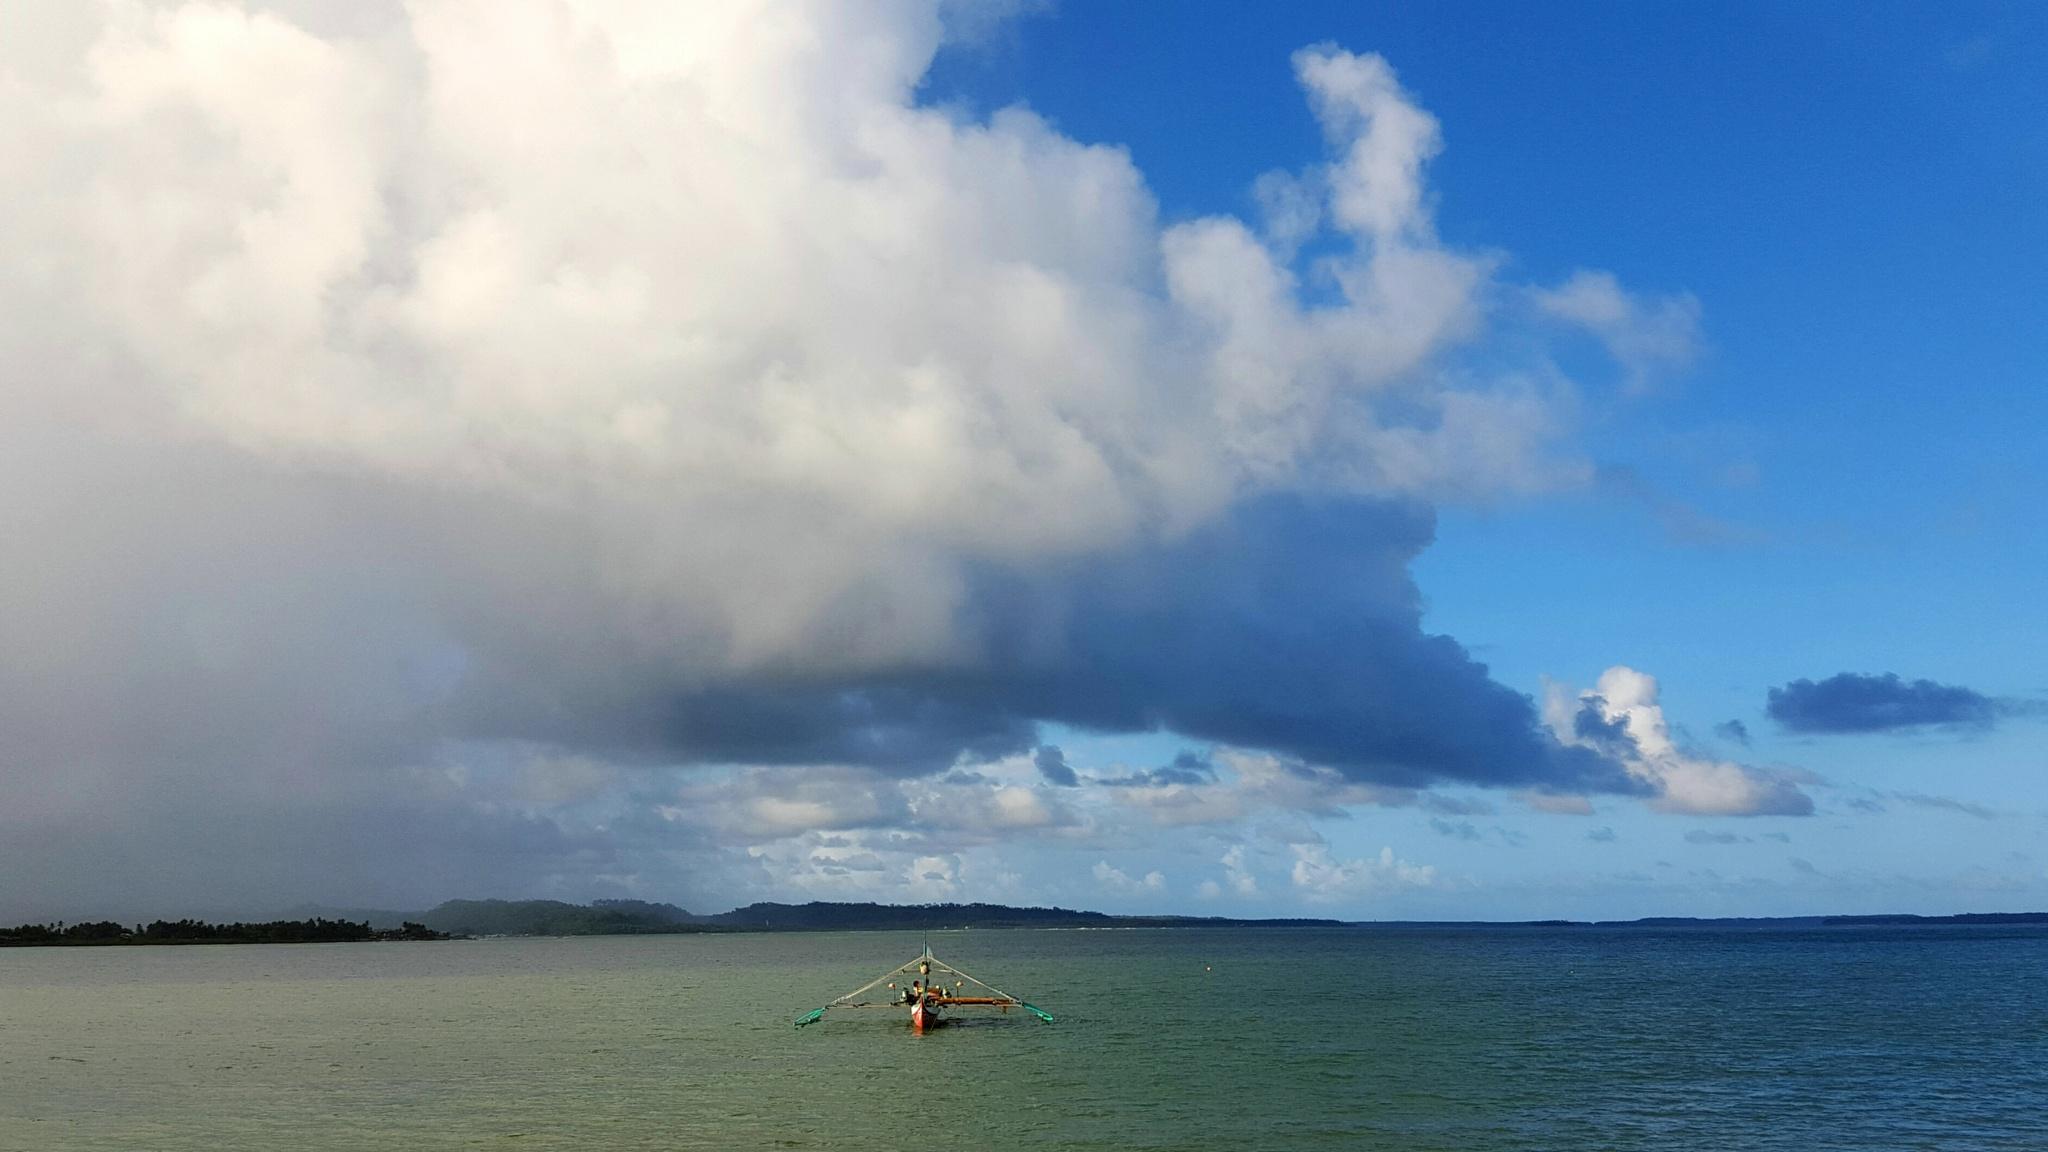 Bicolored Sea by Erlinda Bocar Kantor